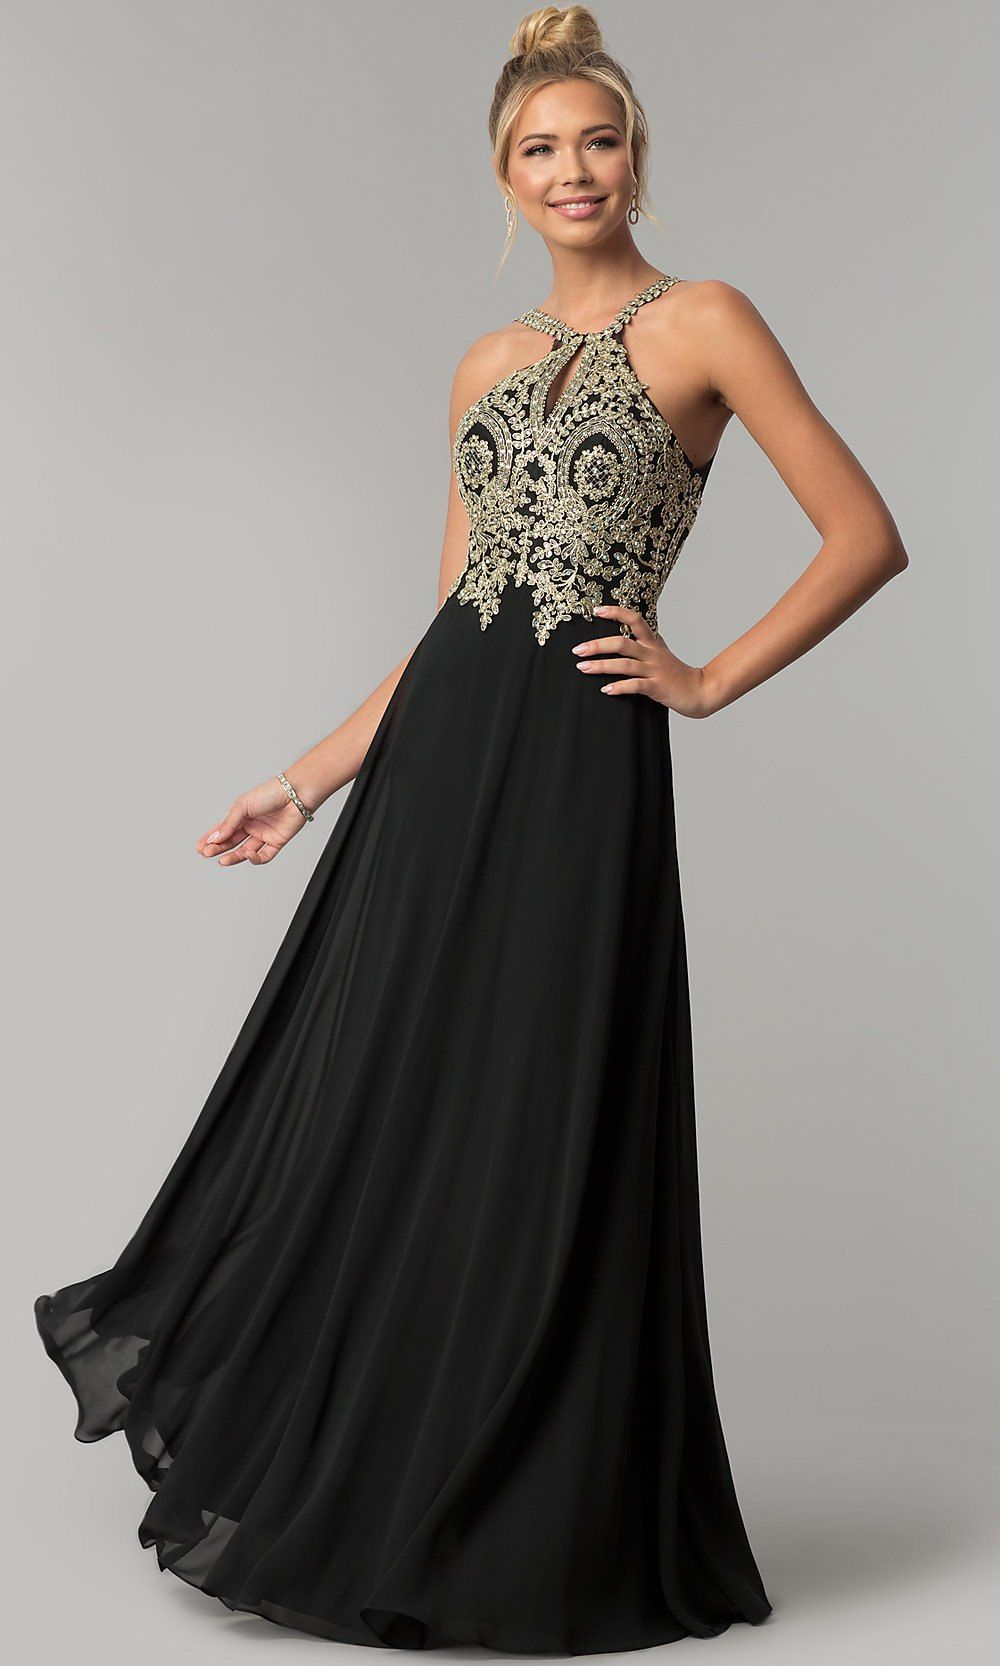 Gold and Black Chiffon Prom Dresses